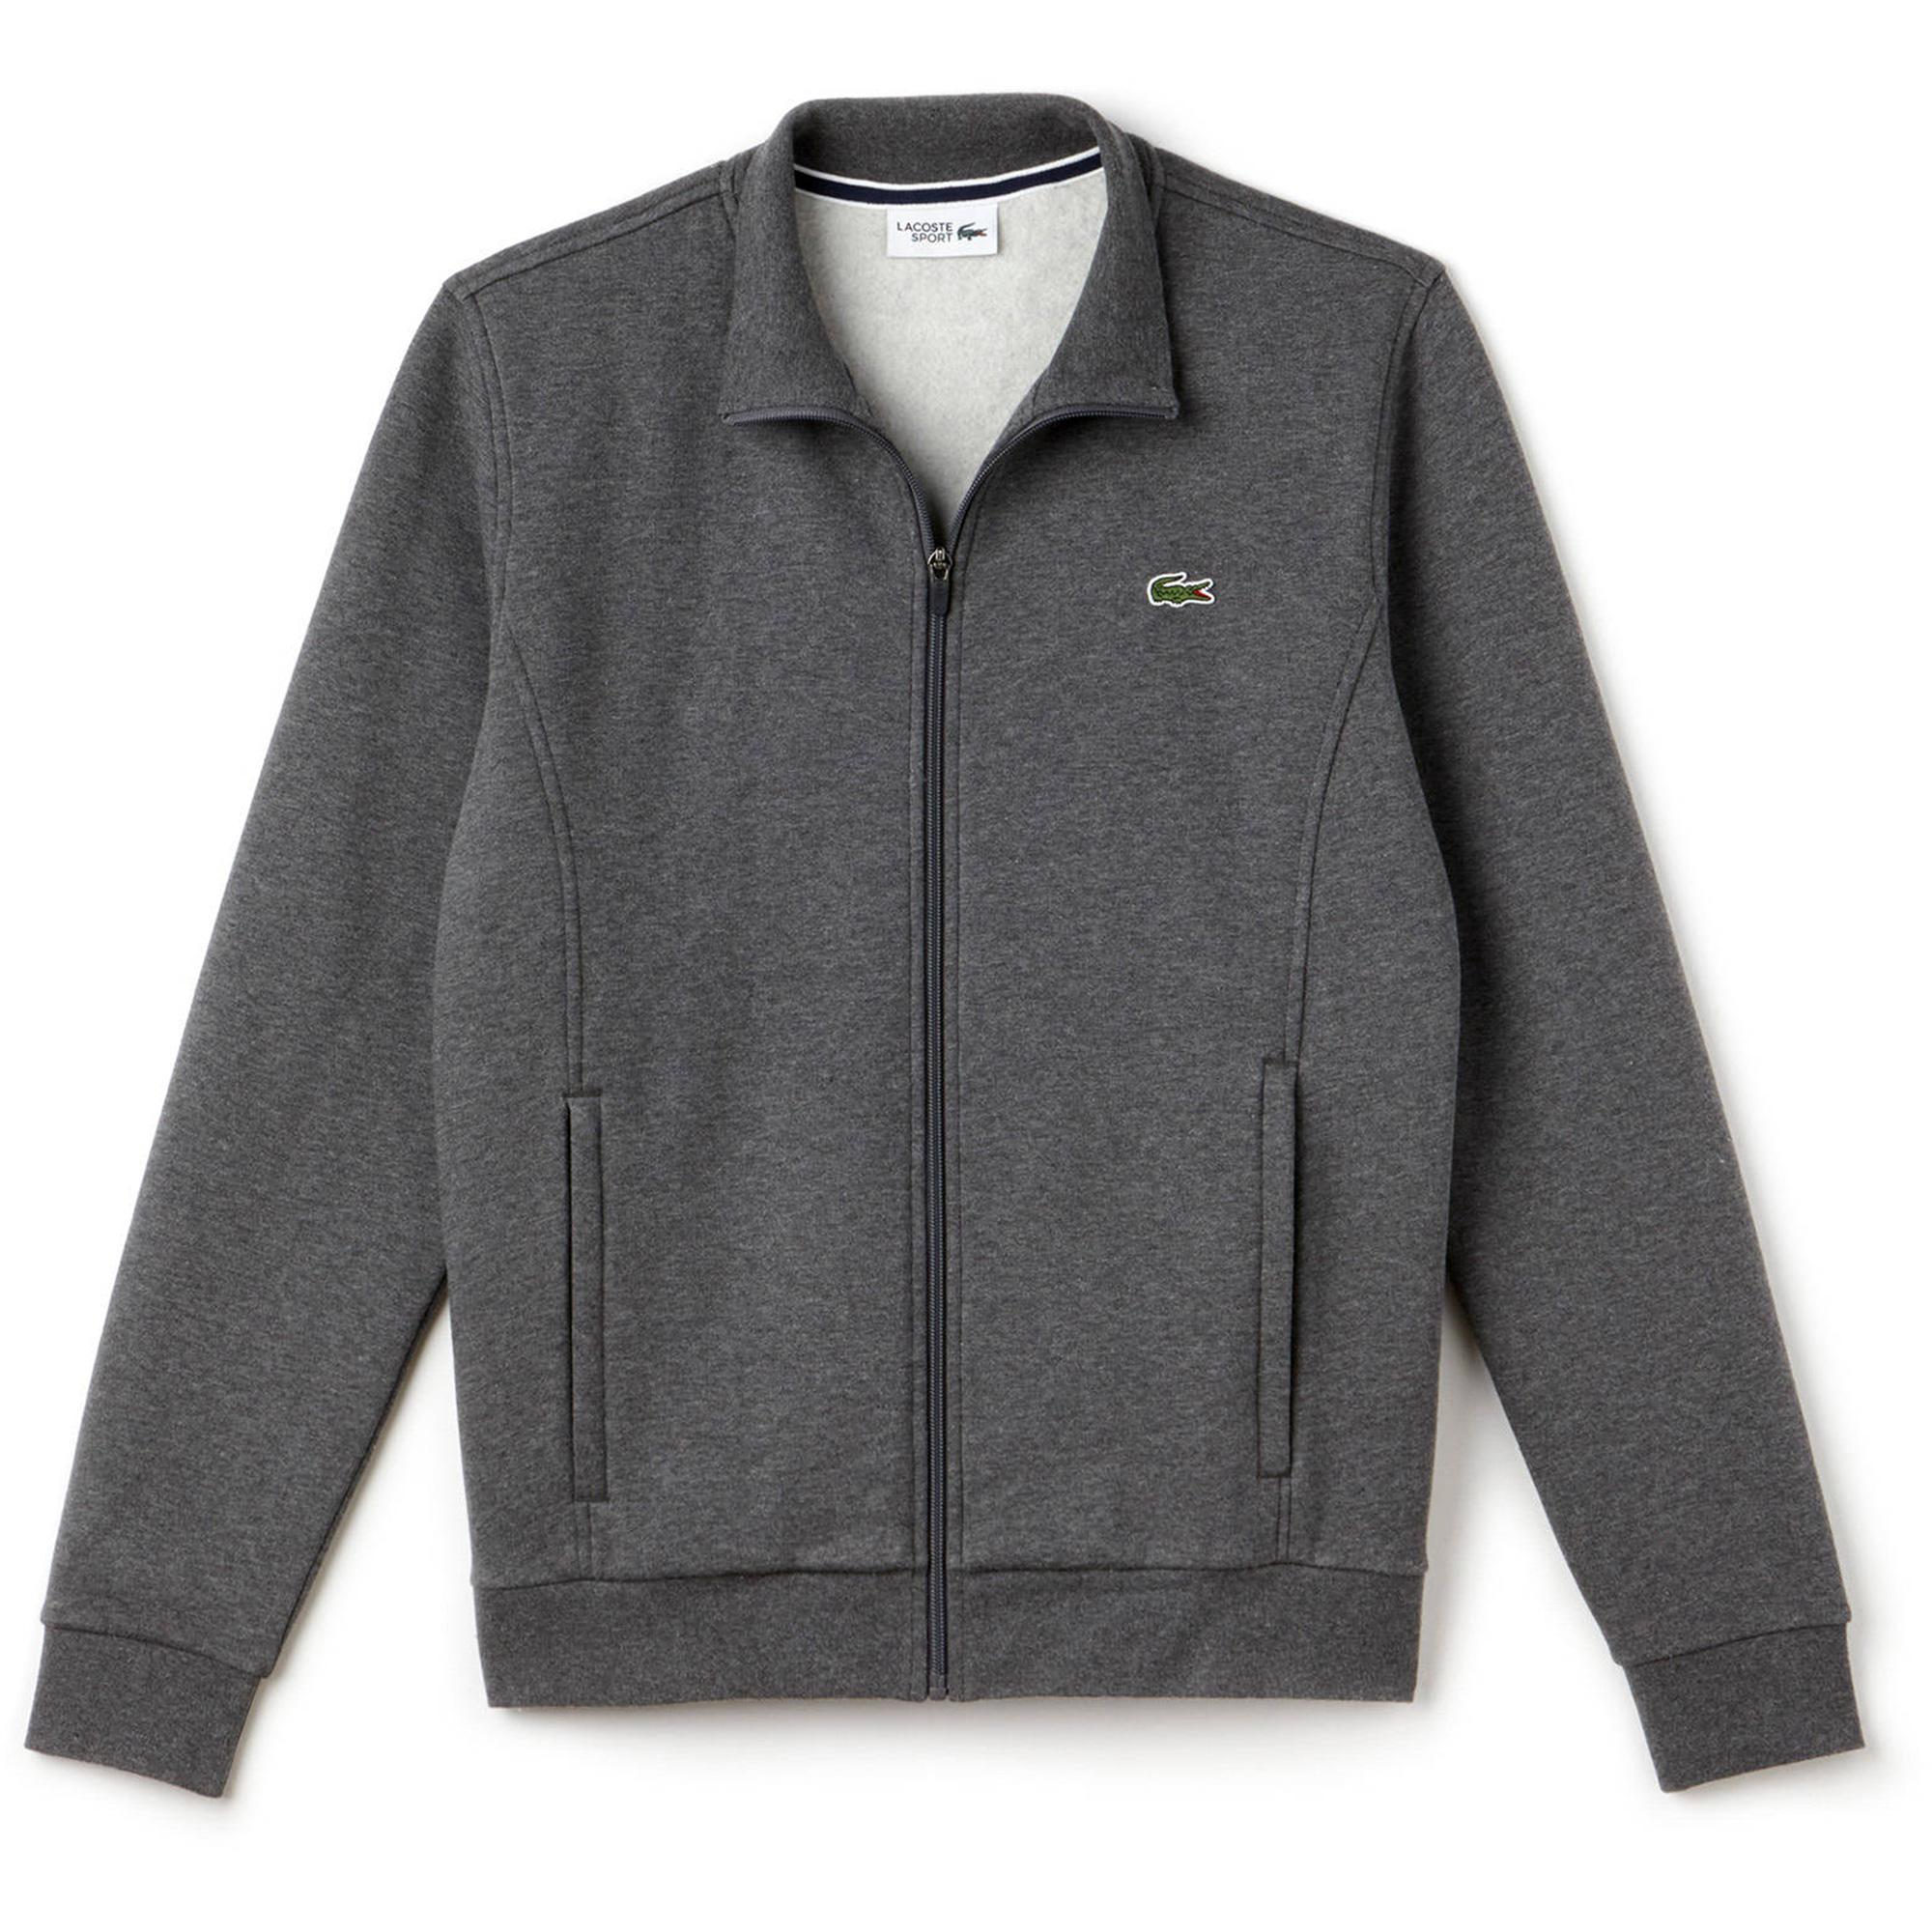 Grey Lacoste Zippered Fleece Mens Sweatshirt Pitch 8wOn0Pk